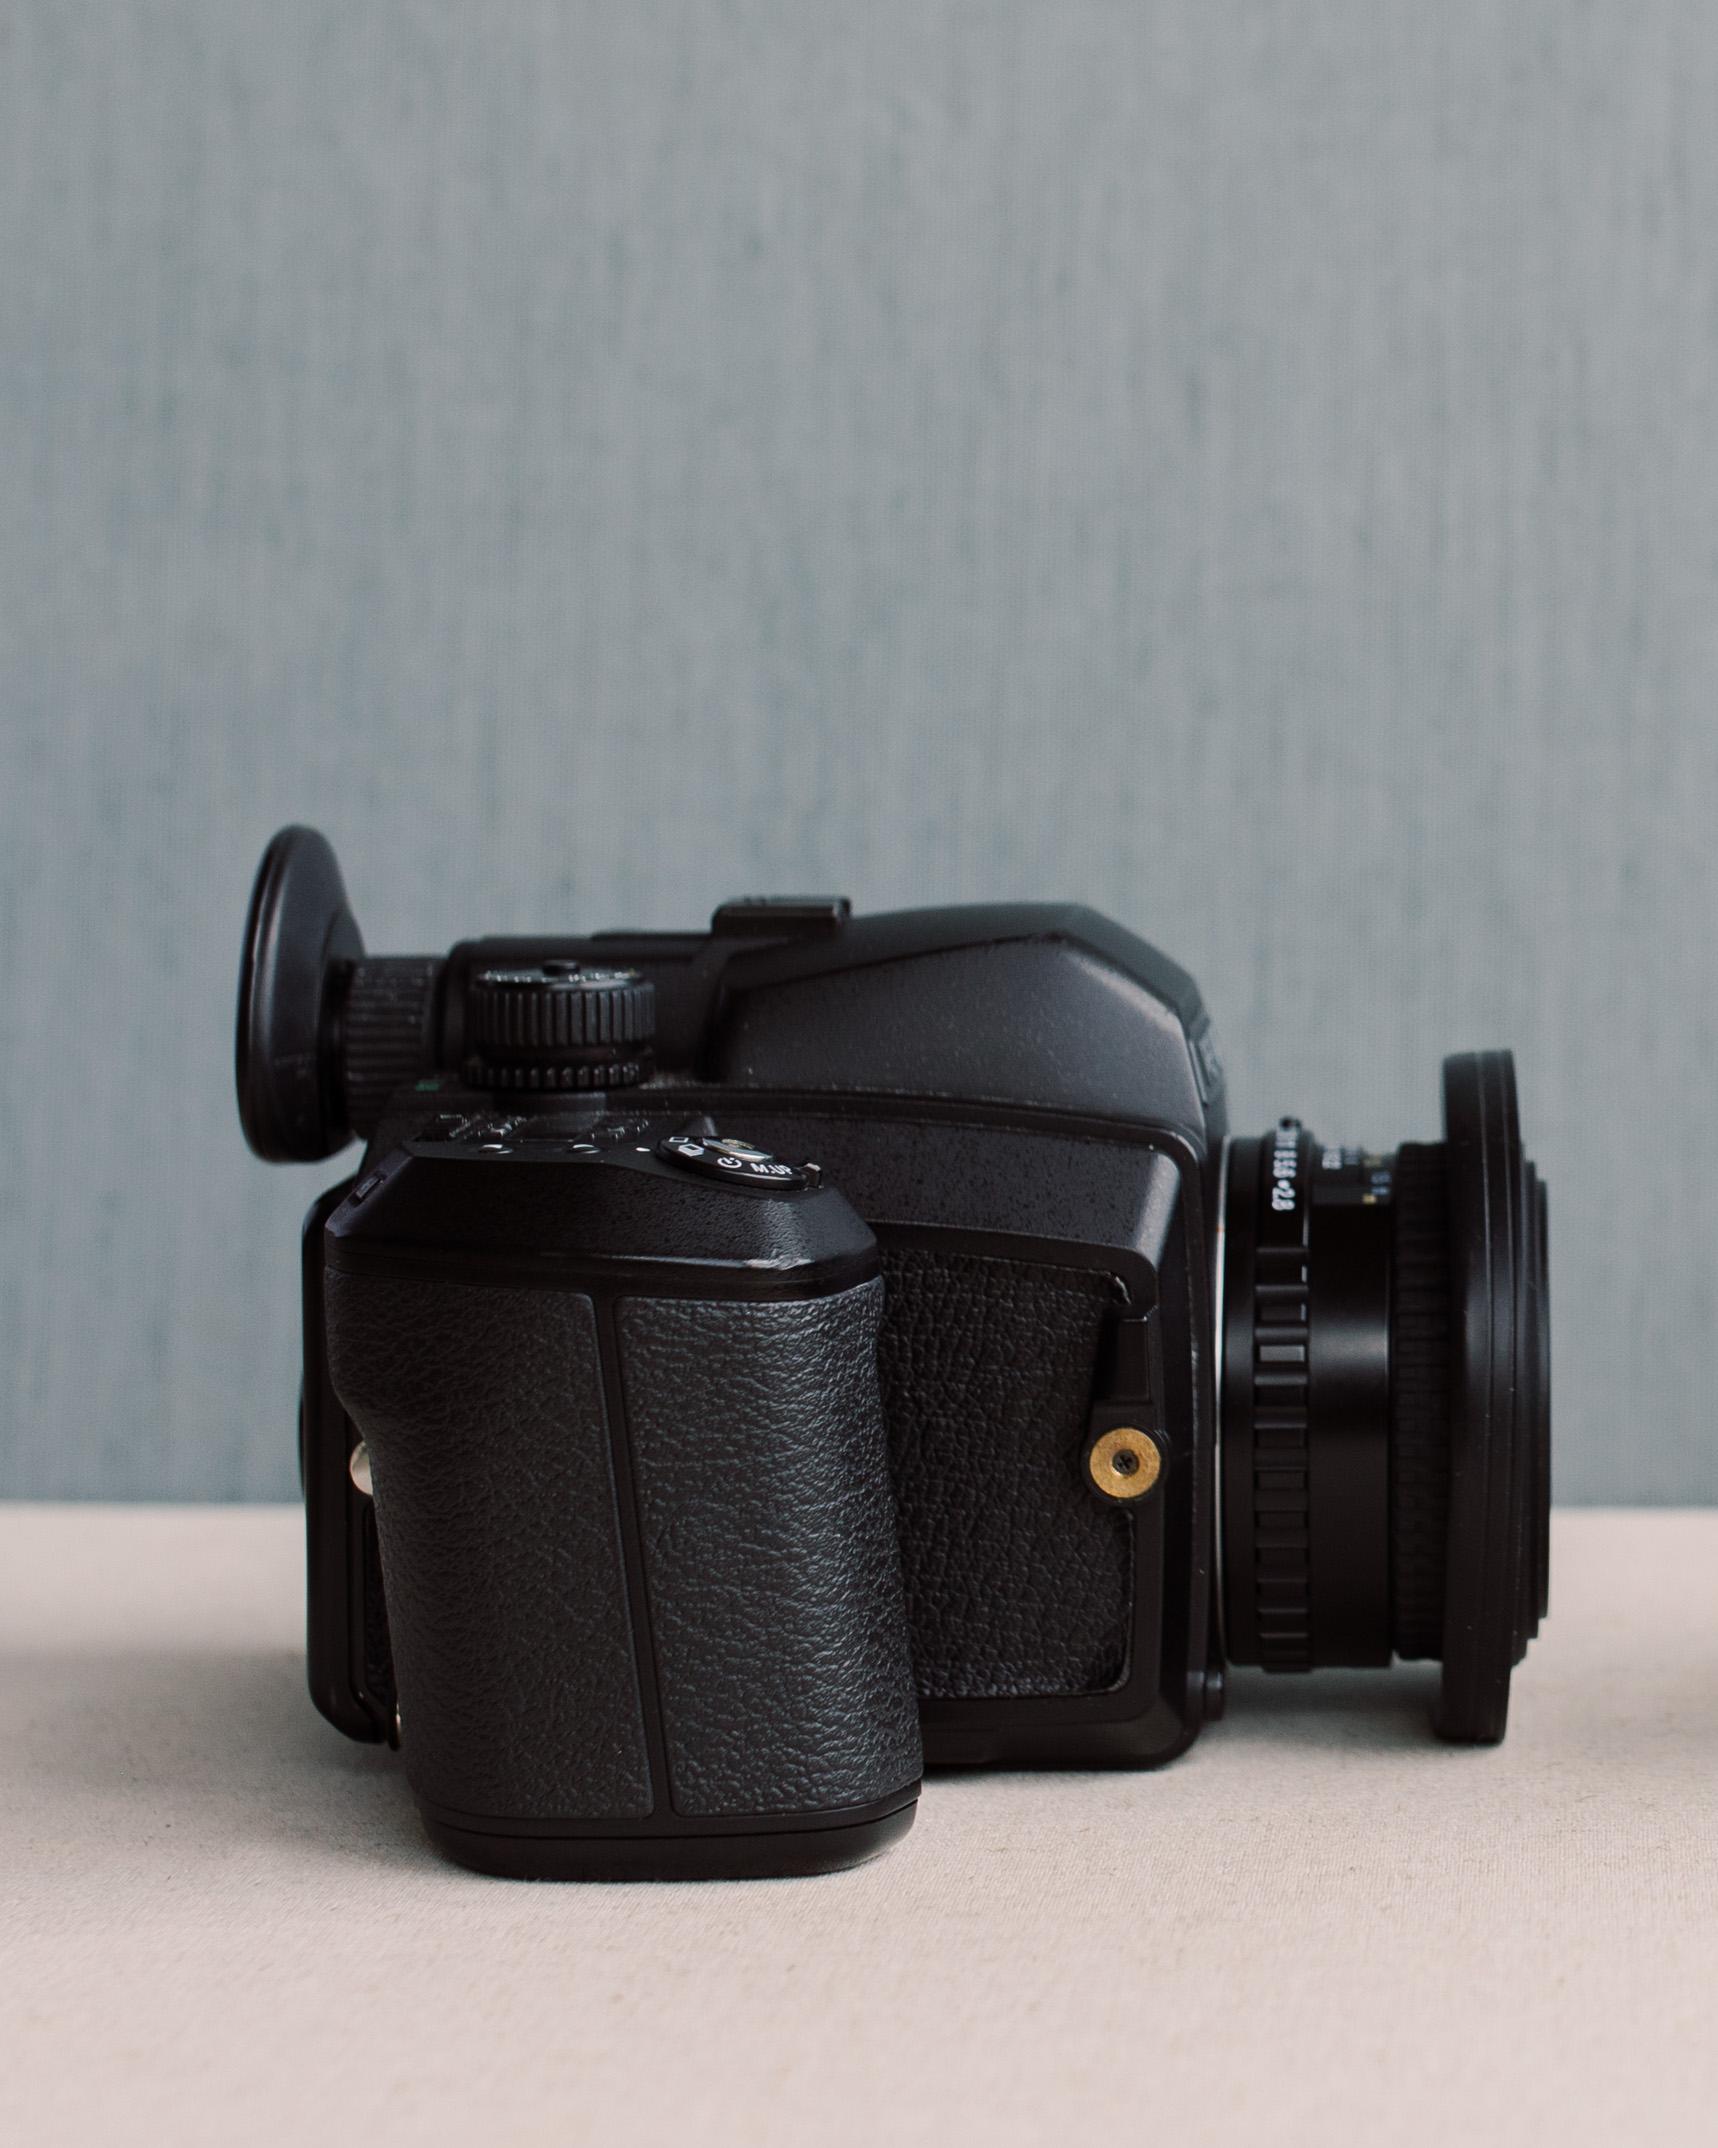 Pentax 645 review image-1-2.jpg